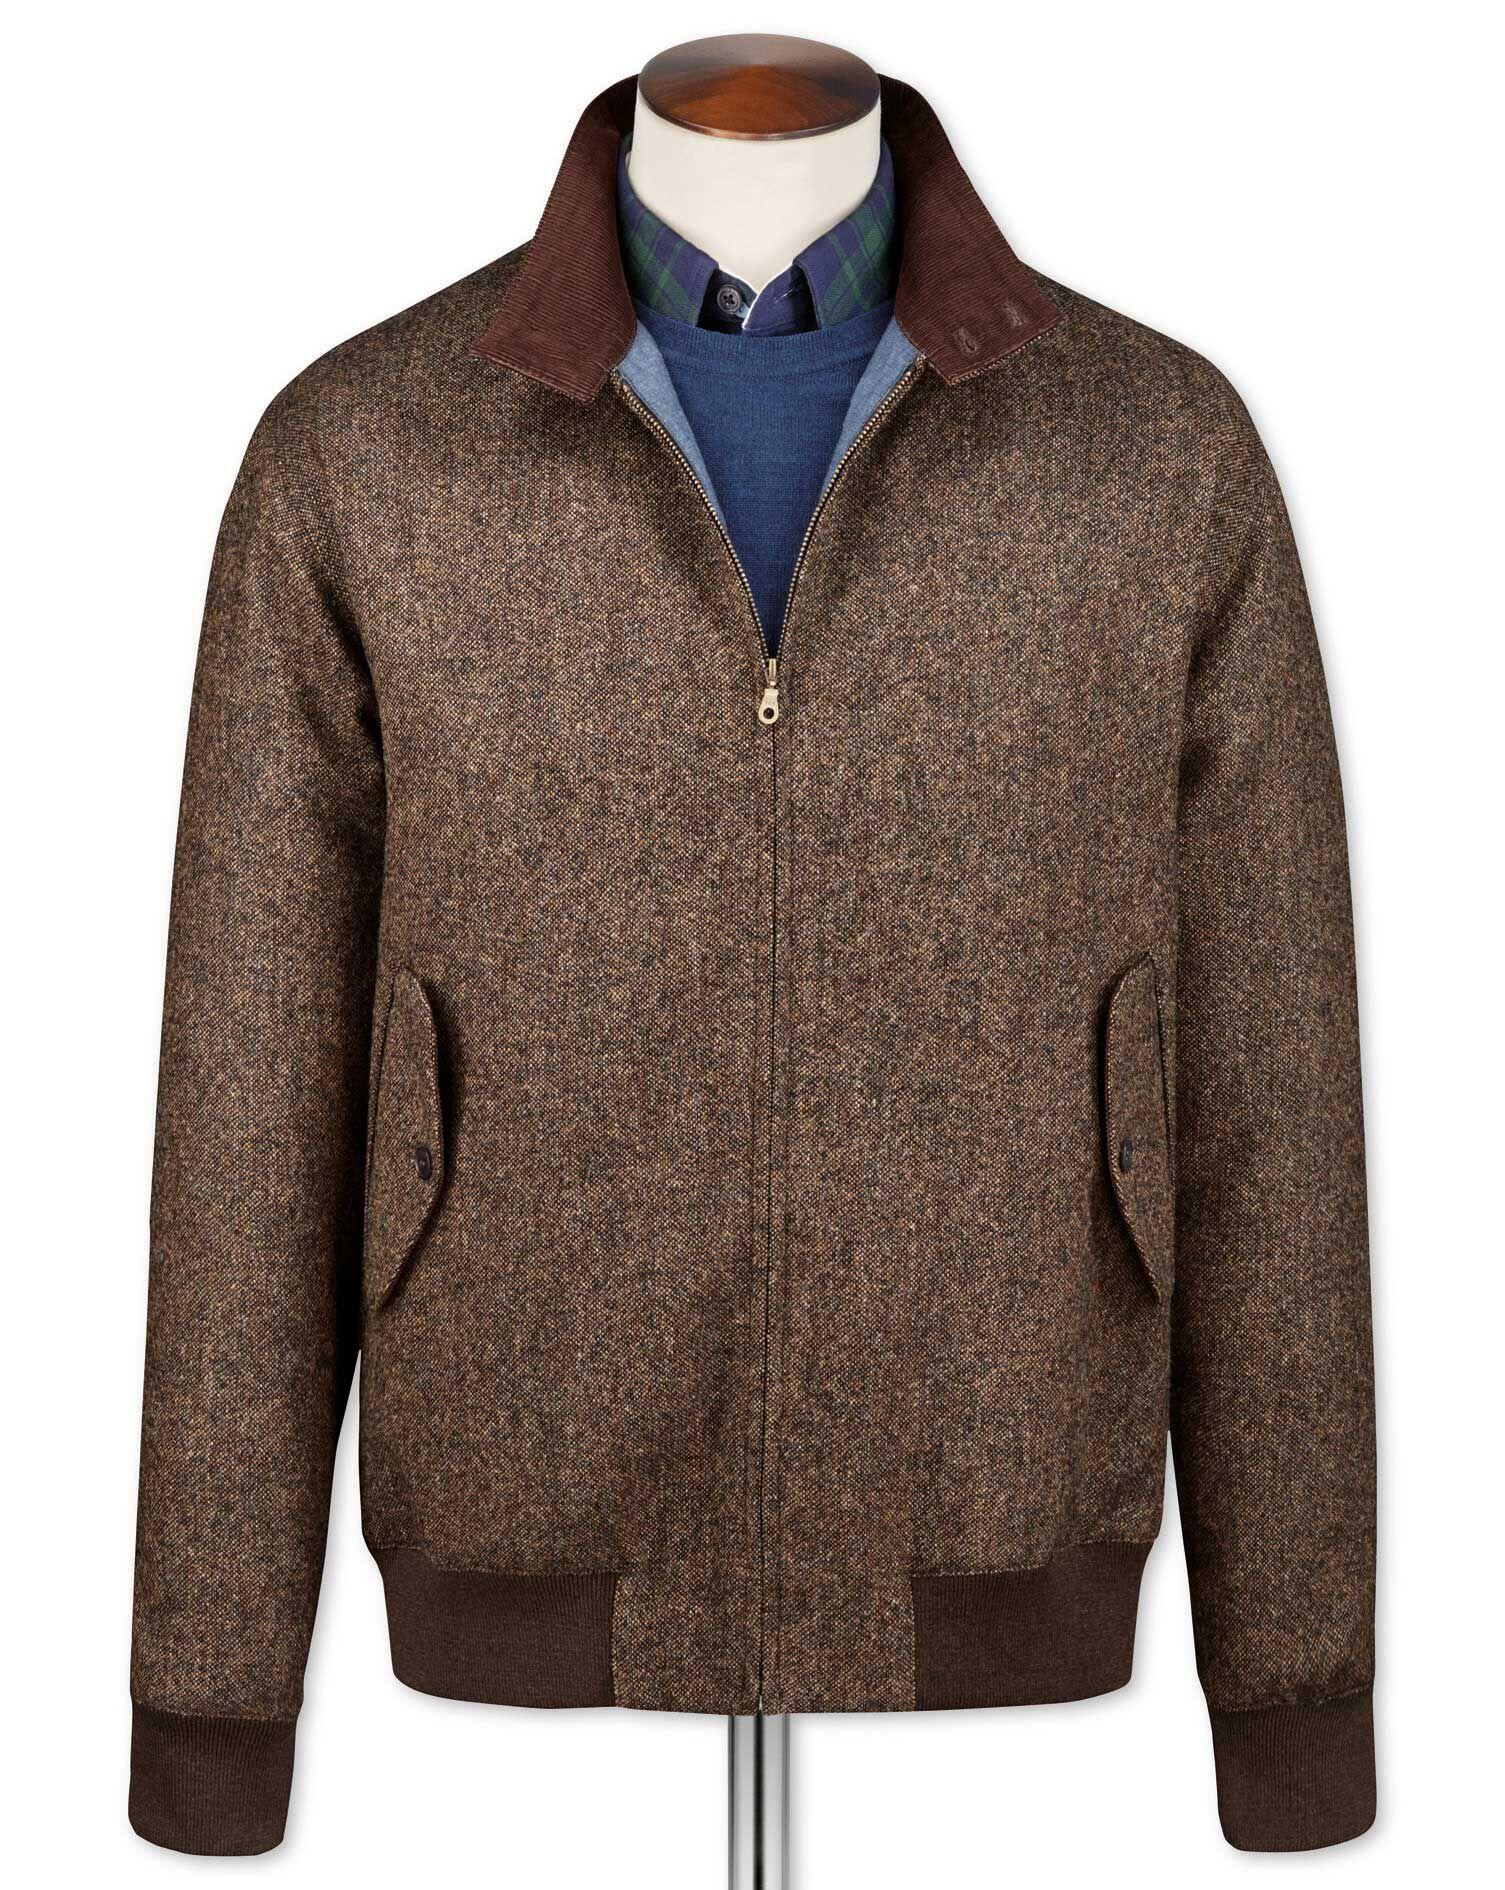 Brown Harrington Wool Jacket Size 40 Regular by Charles Tyrwhitt